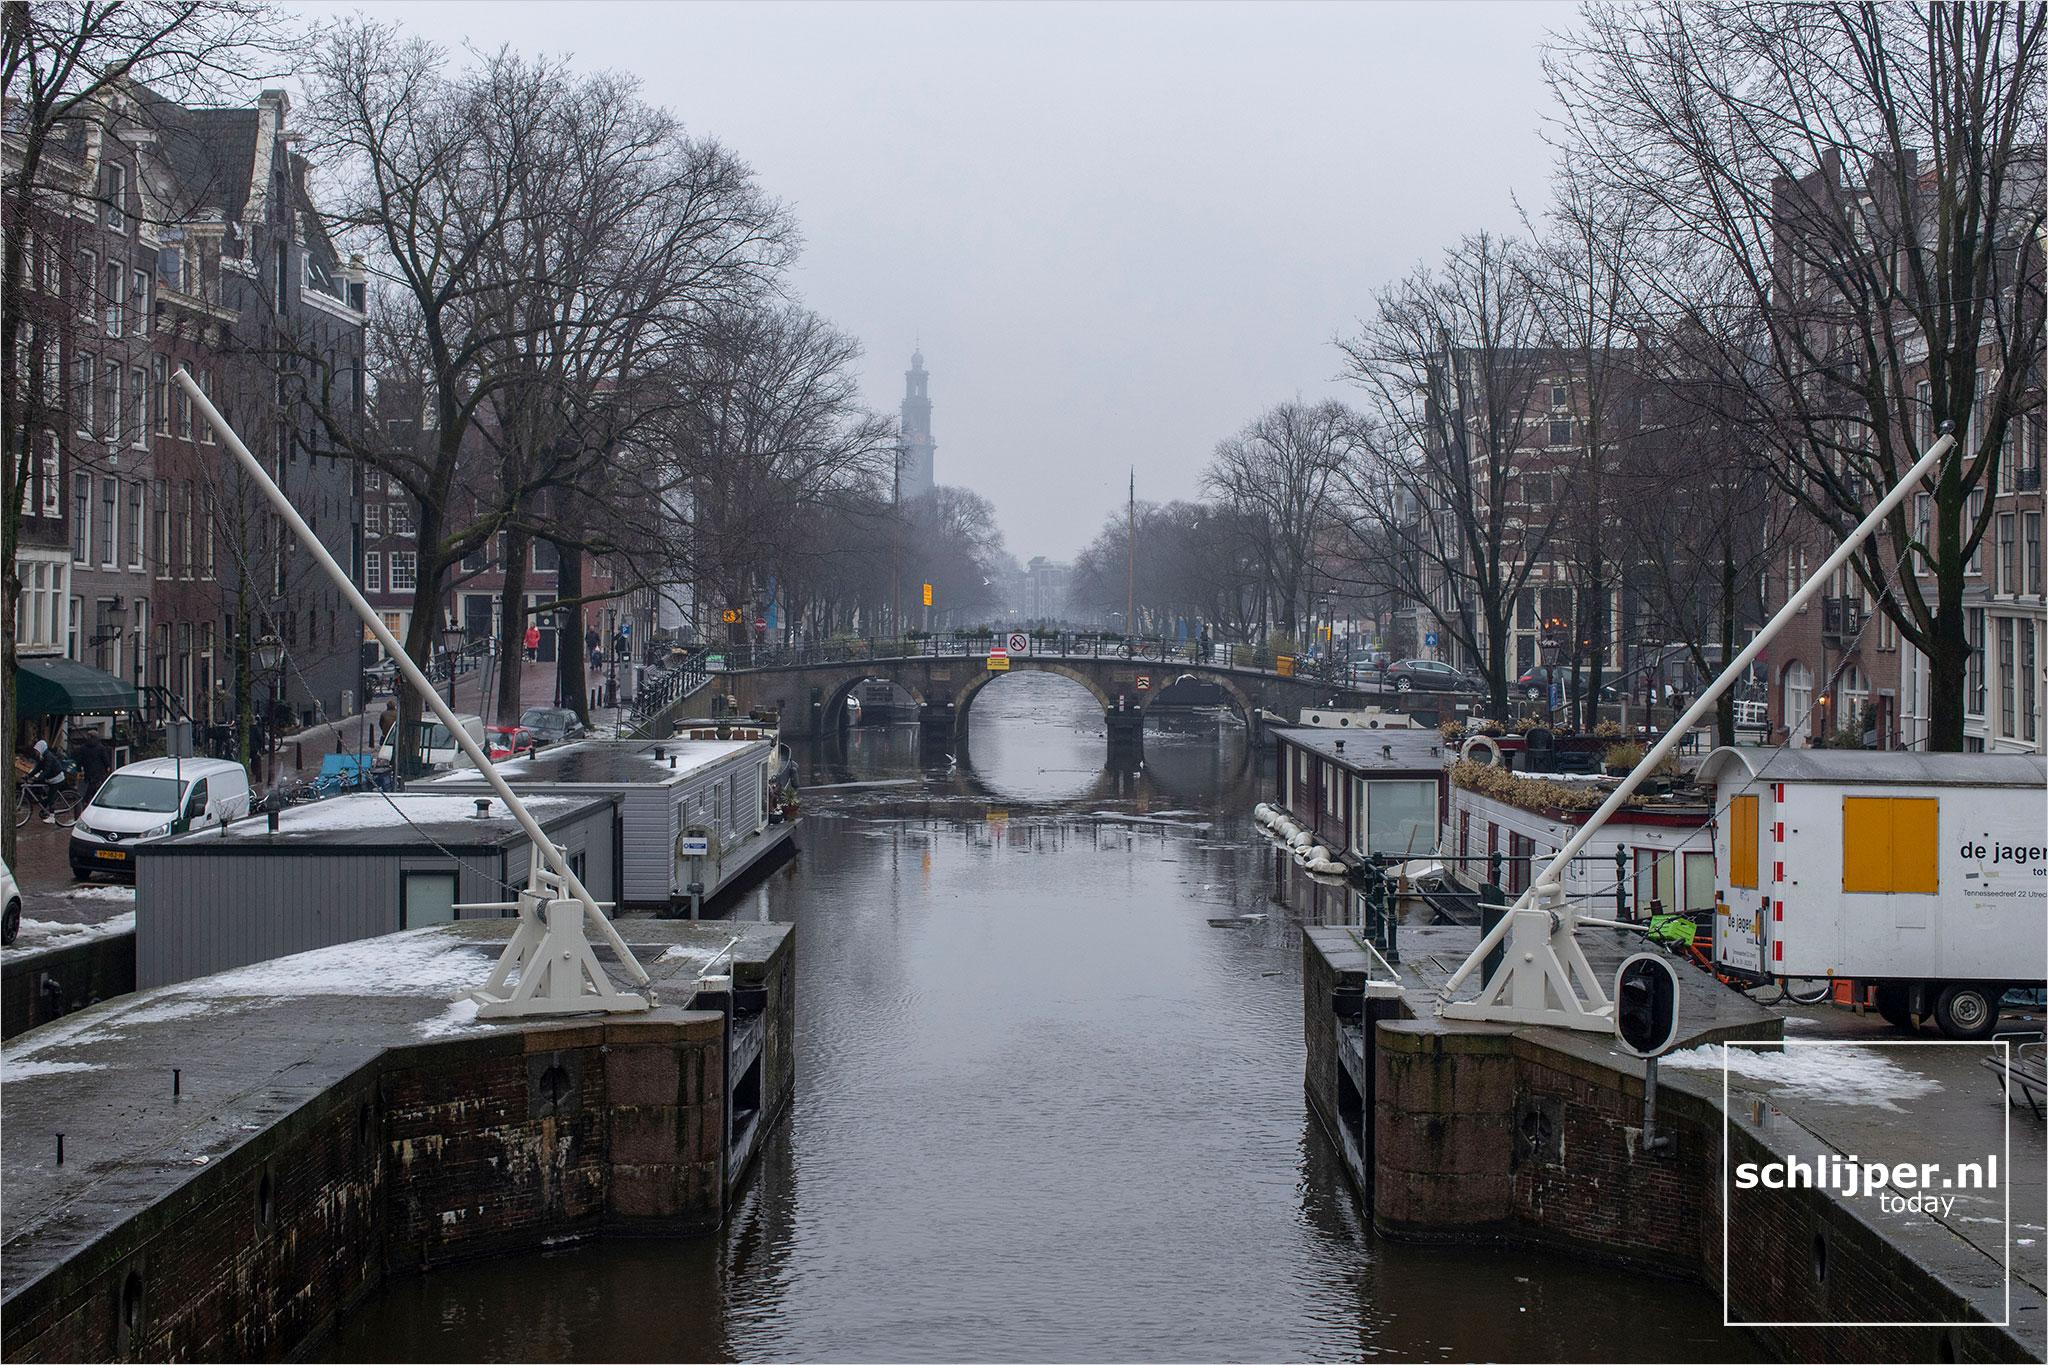 The Netherlands, Amsterdam, 15 februari 2021